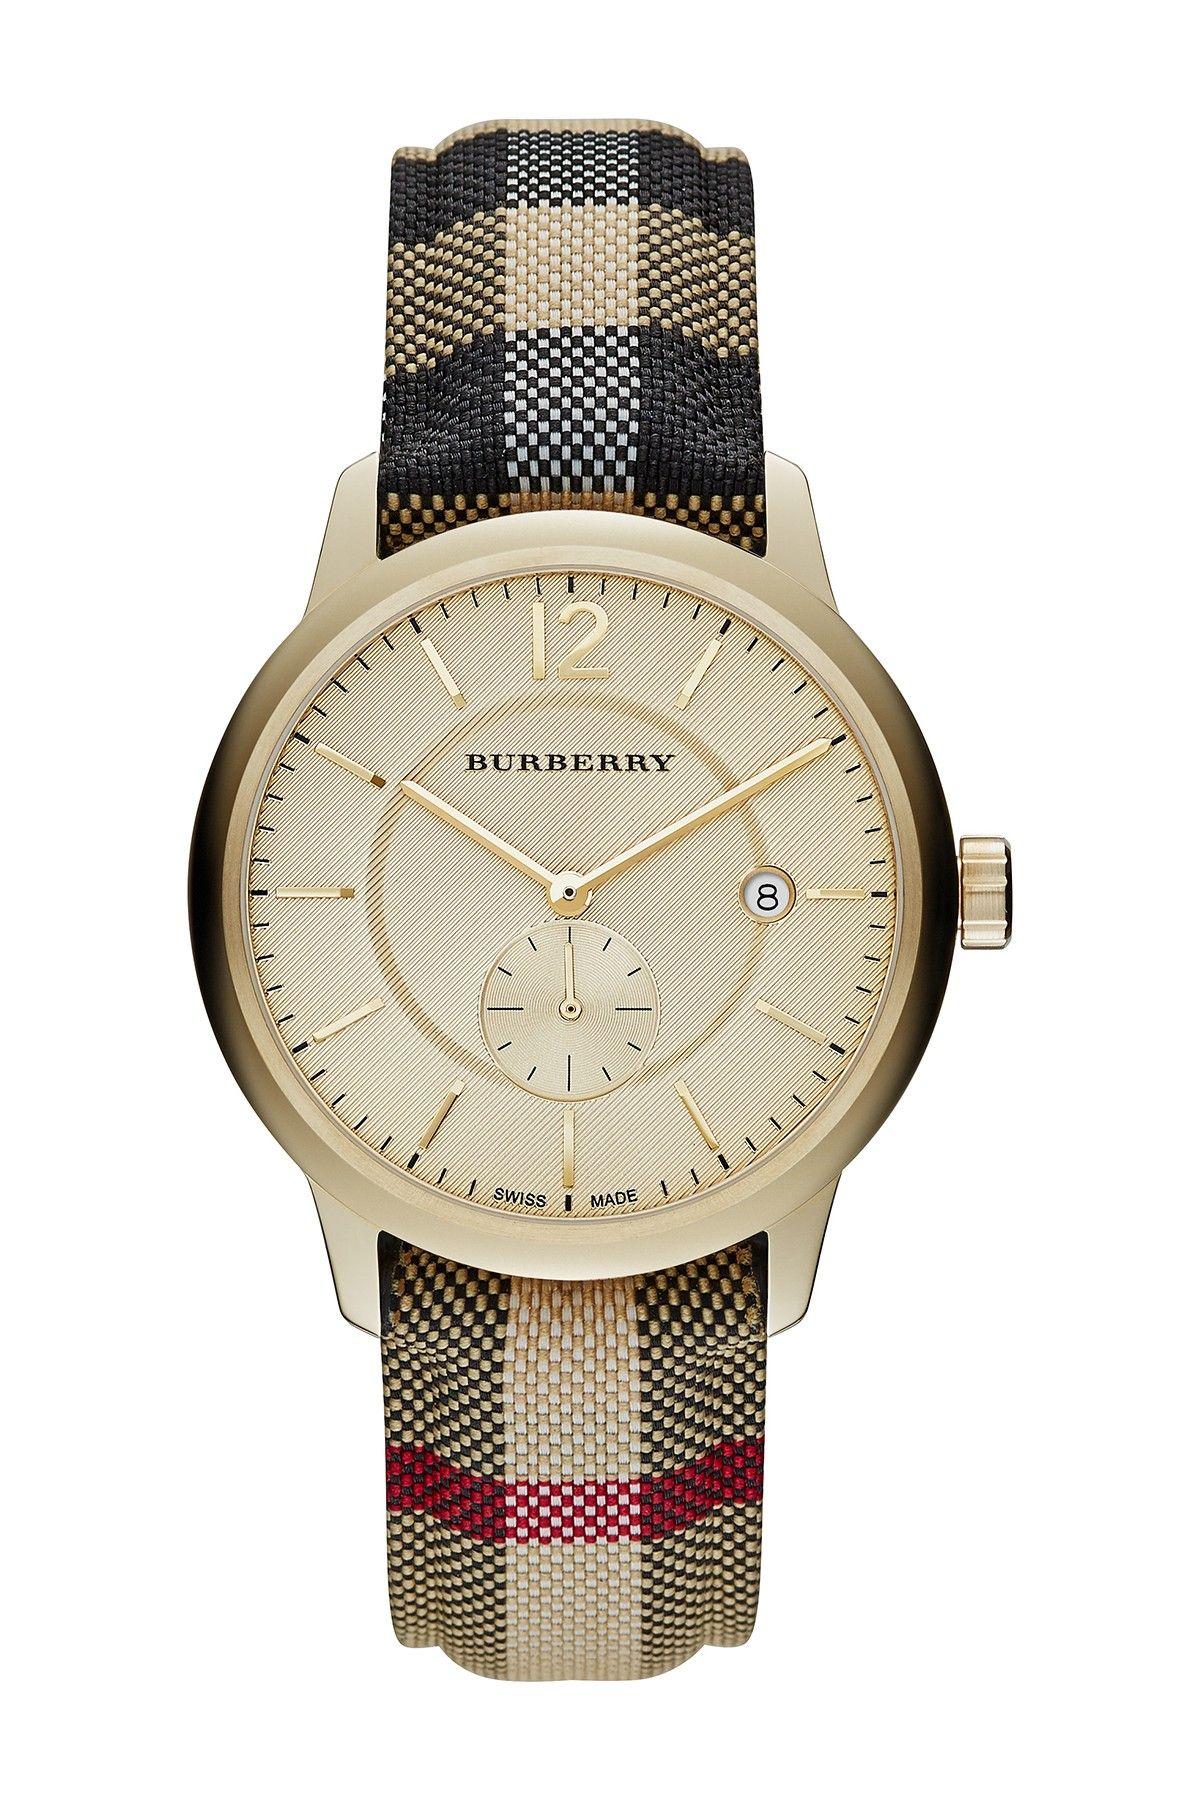 60d1efdc948 Men s Honey Horeseferry Watch by Burberry on  nordstrom rack